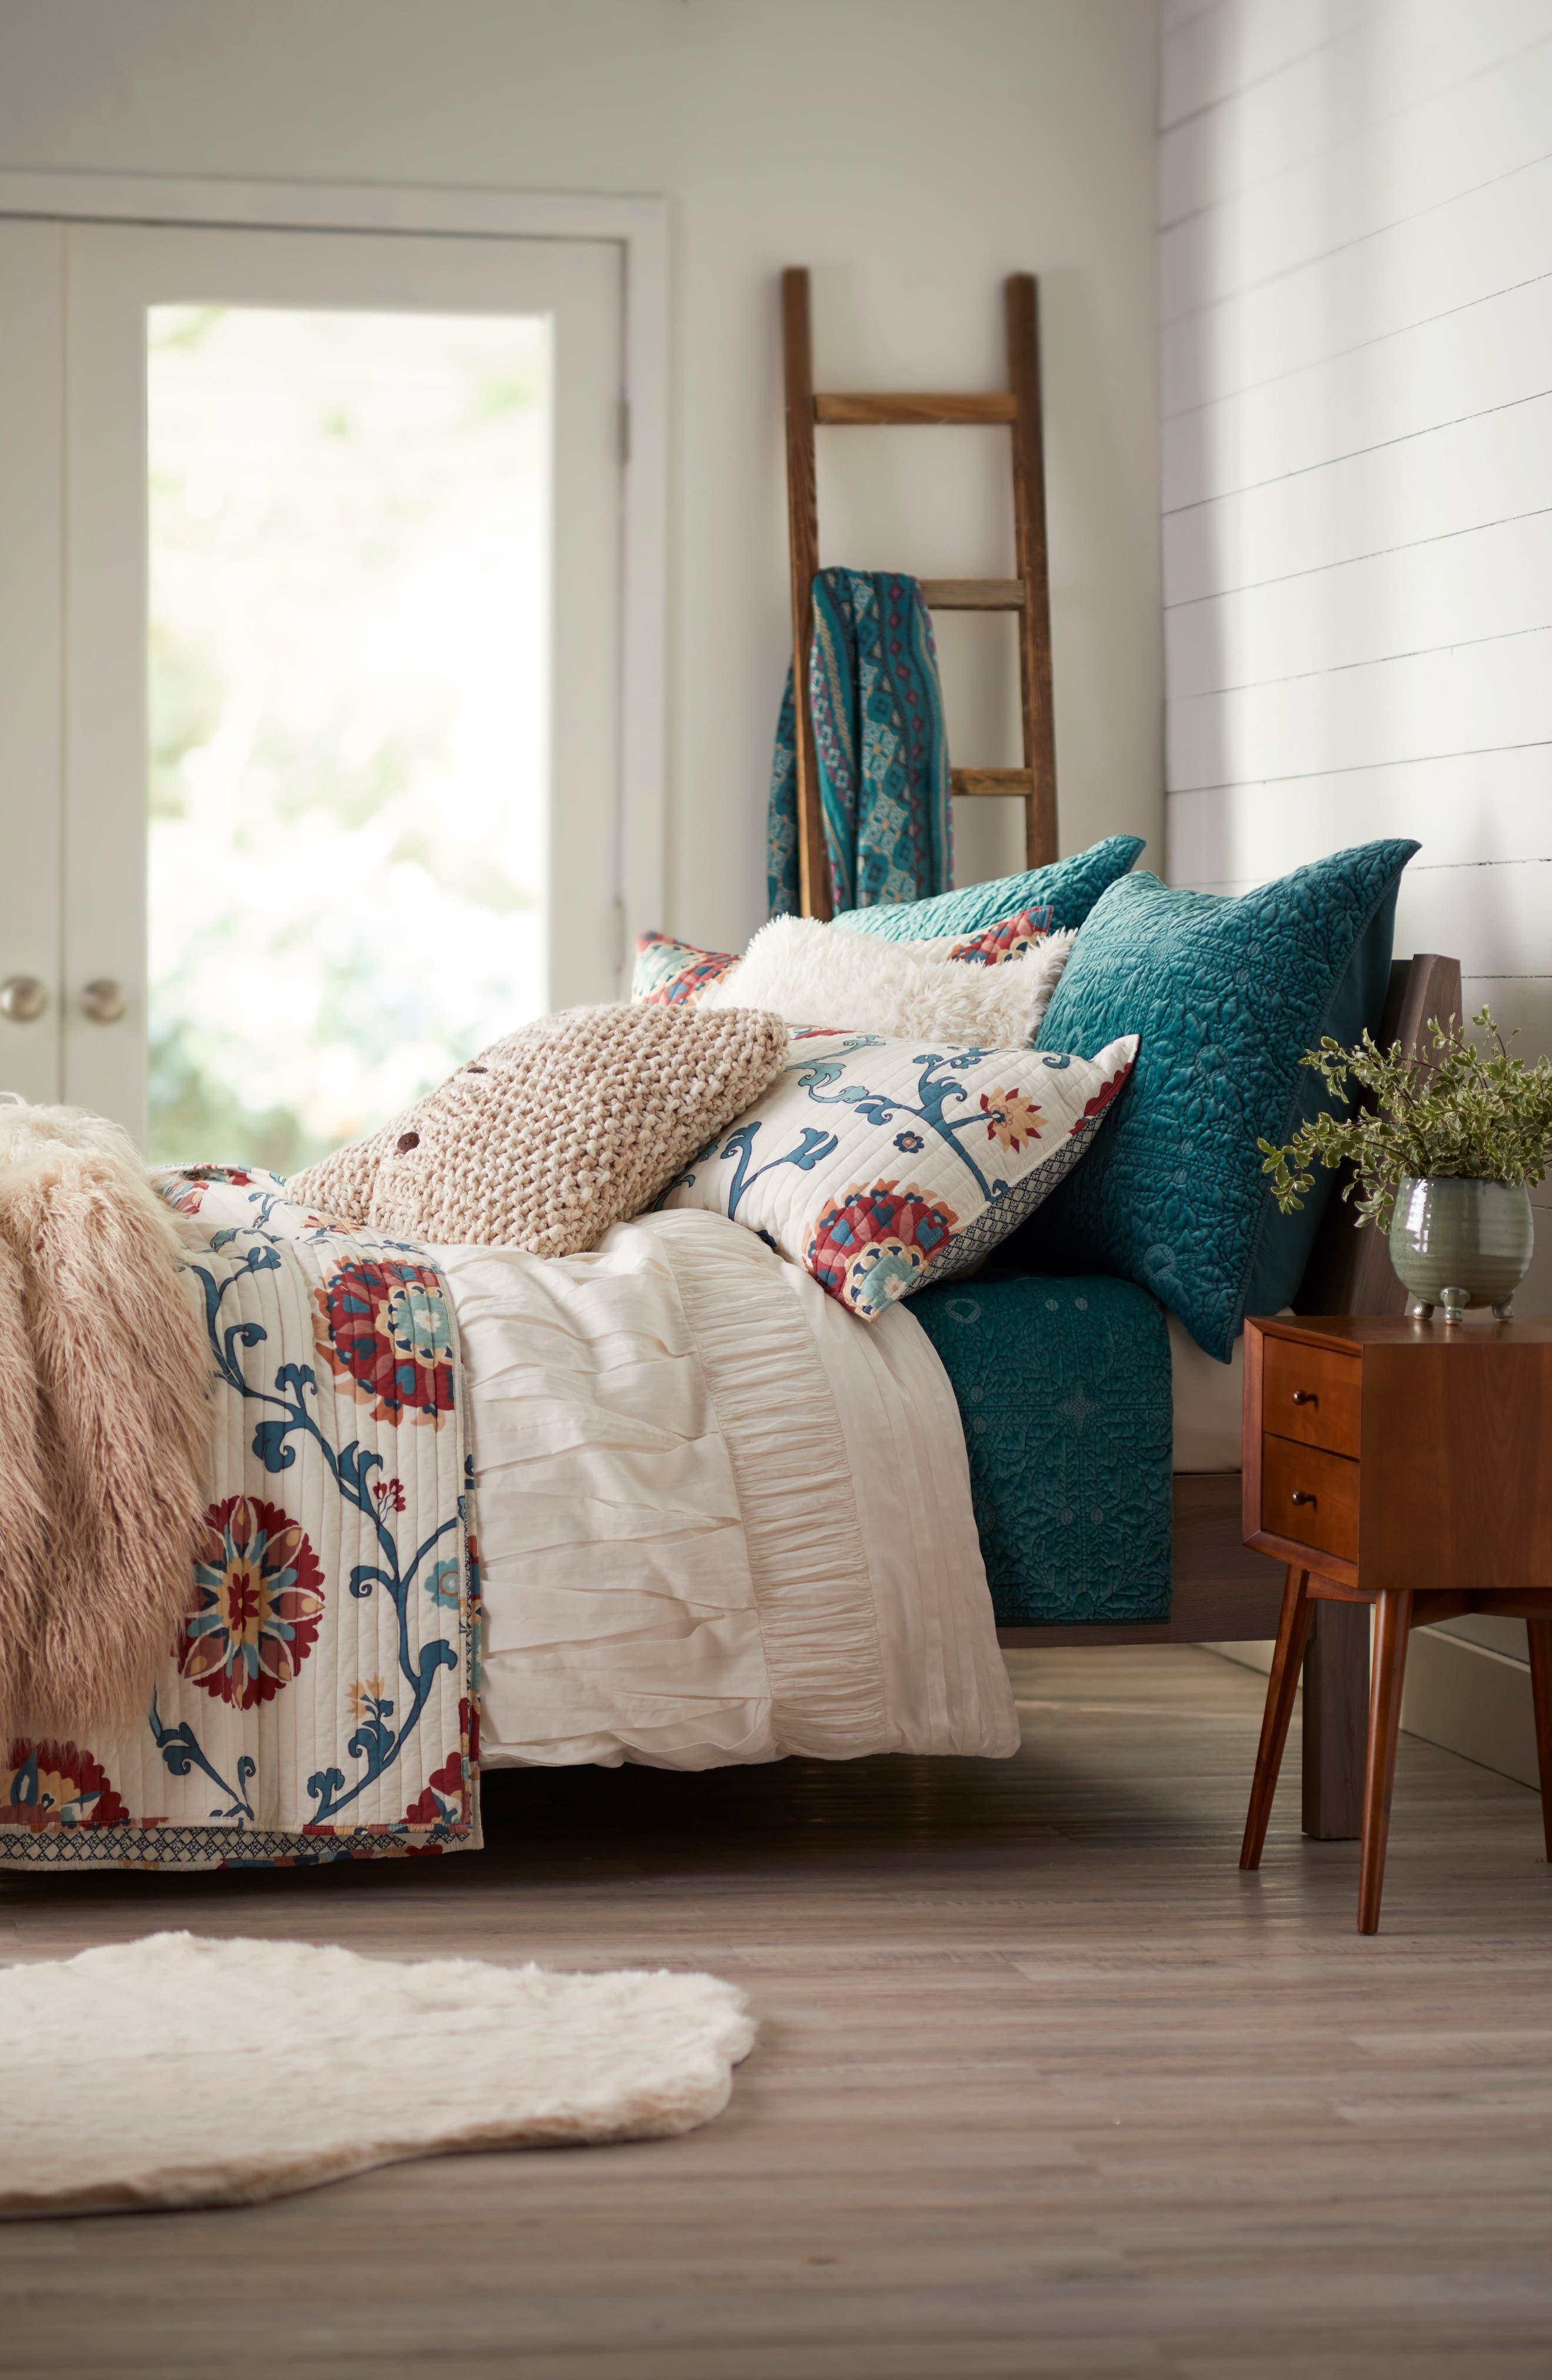 Nordstrom at Home Mixed Texture Duvet, Washing Velvet Quilt & Levtex Folk Art Quilt Bedding Collection